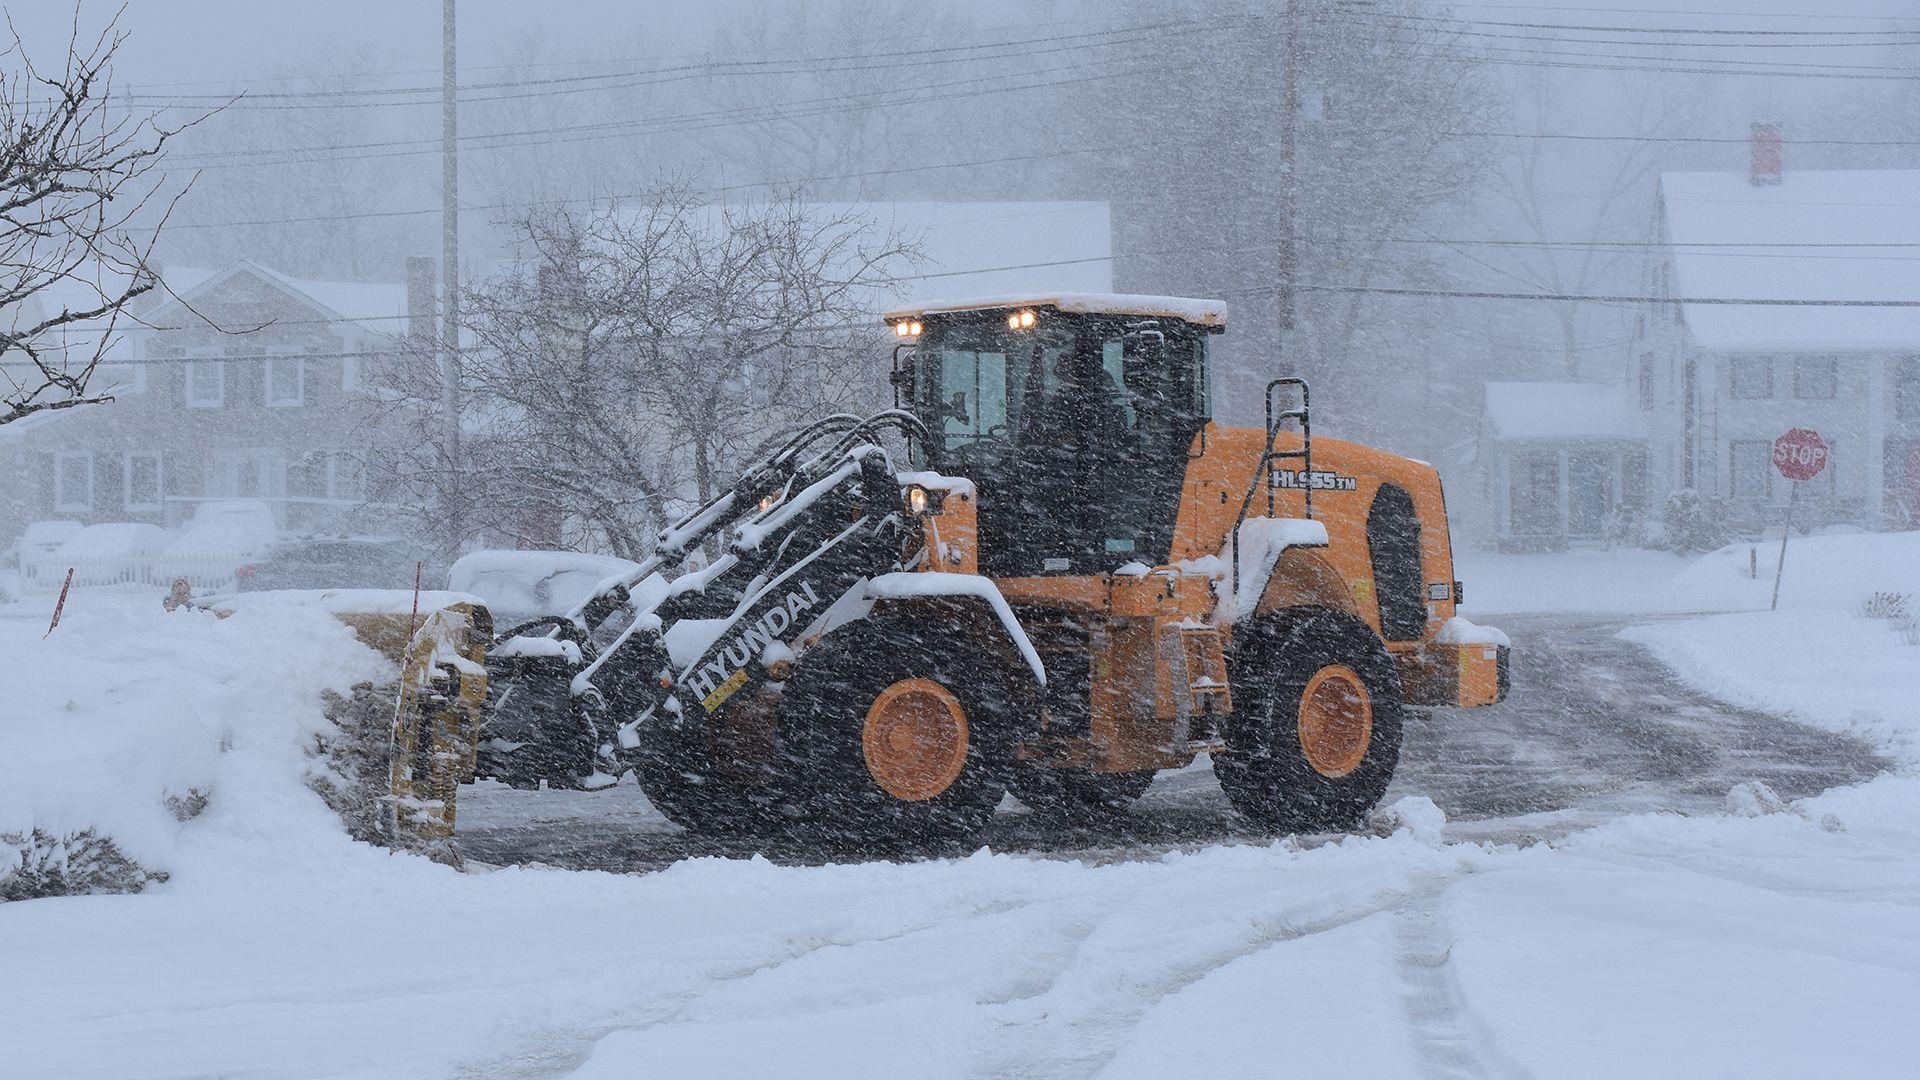 hight resolution of hl955tm steven desmarais snow removal